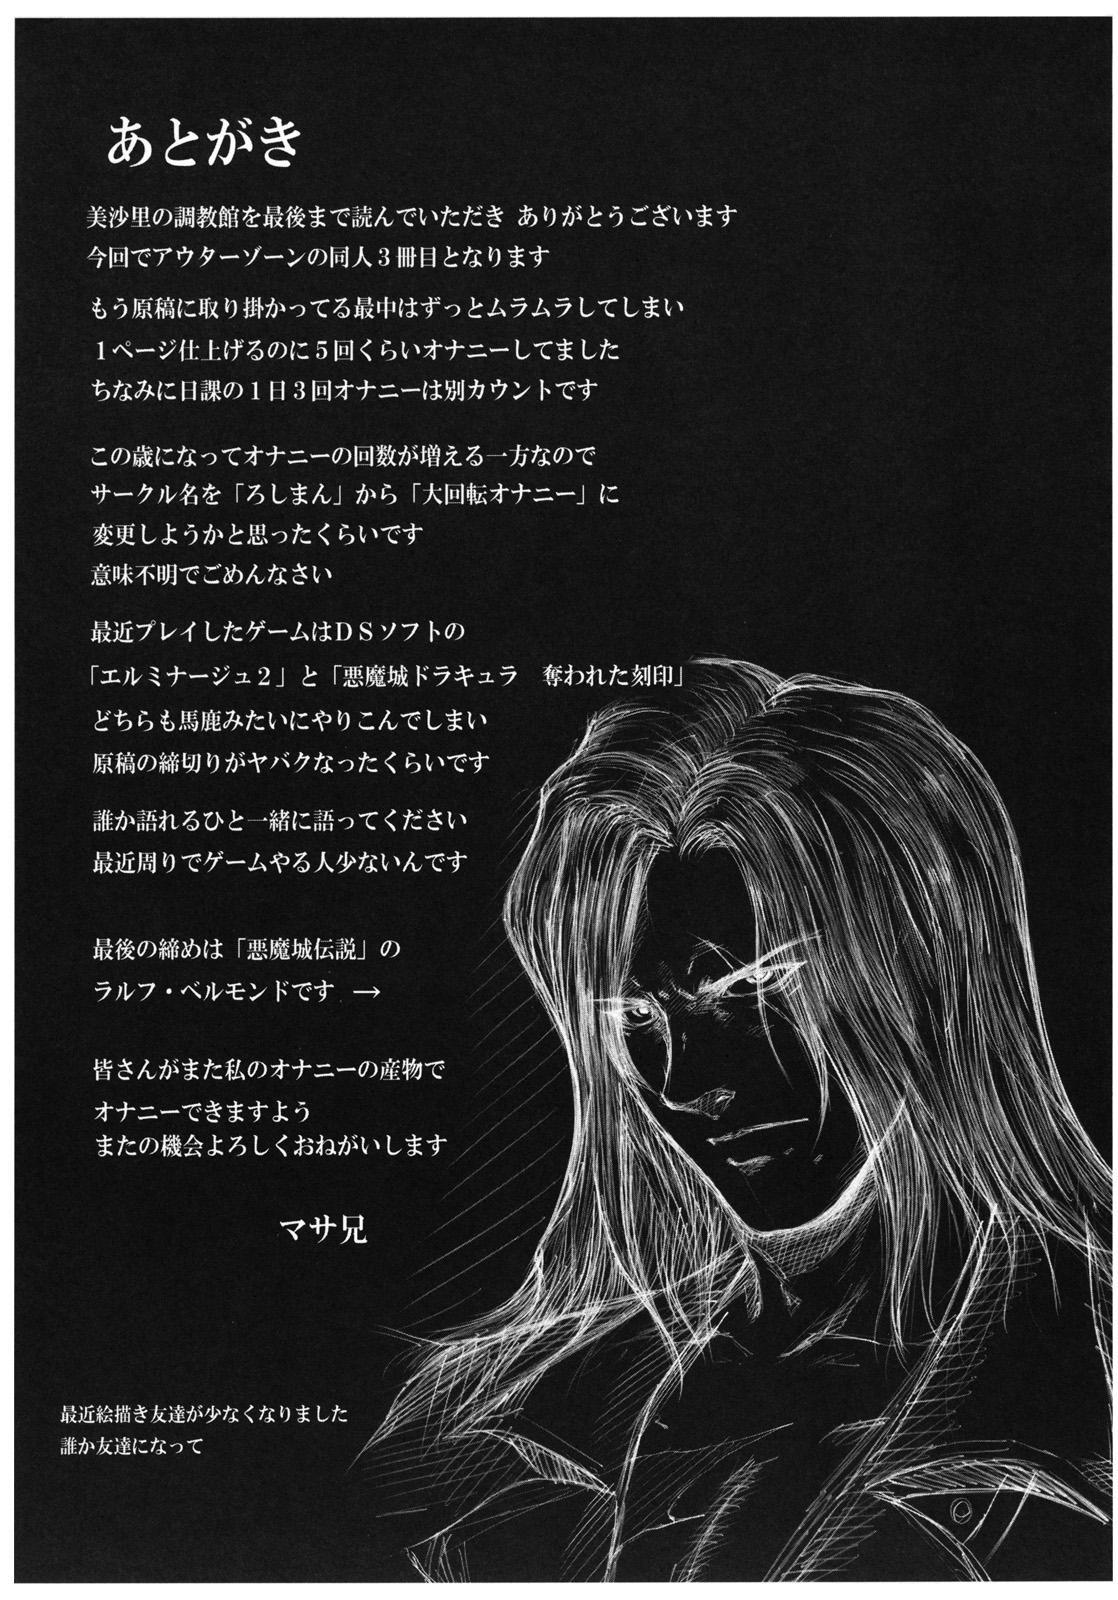 Misery no Choukyoukan 31